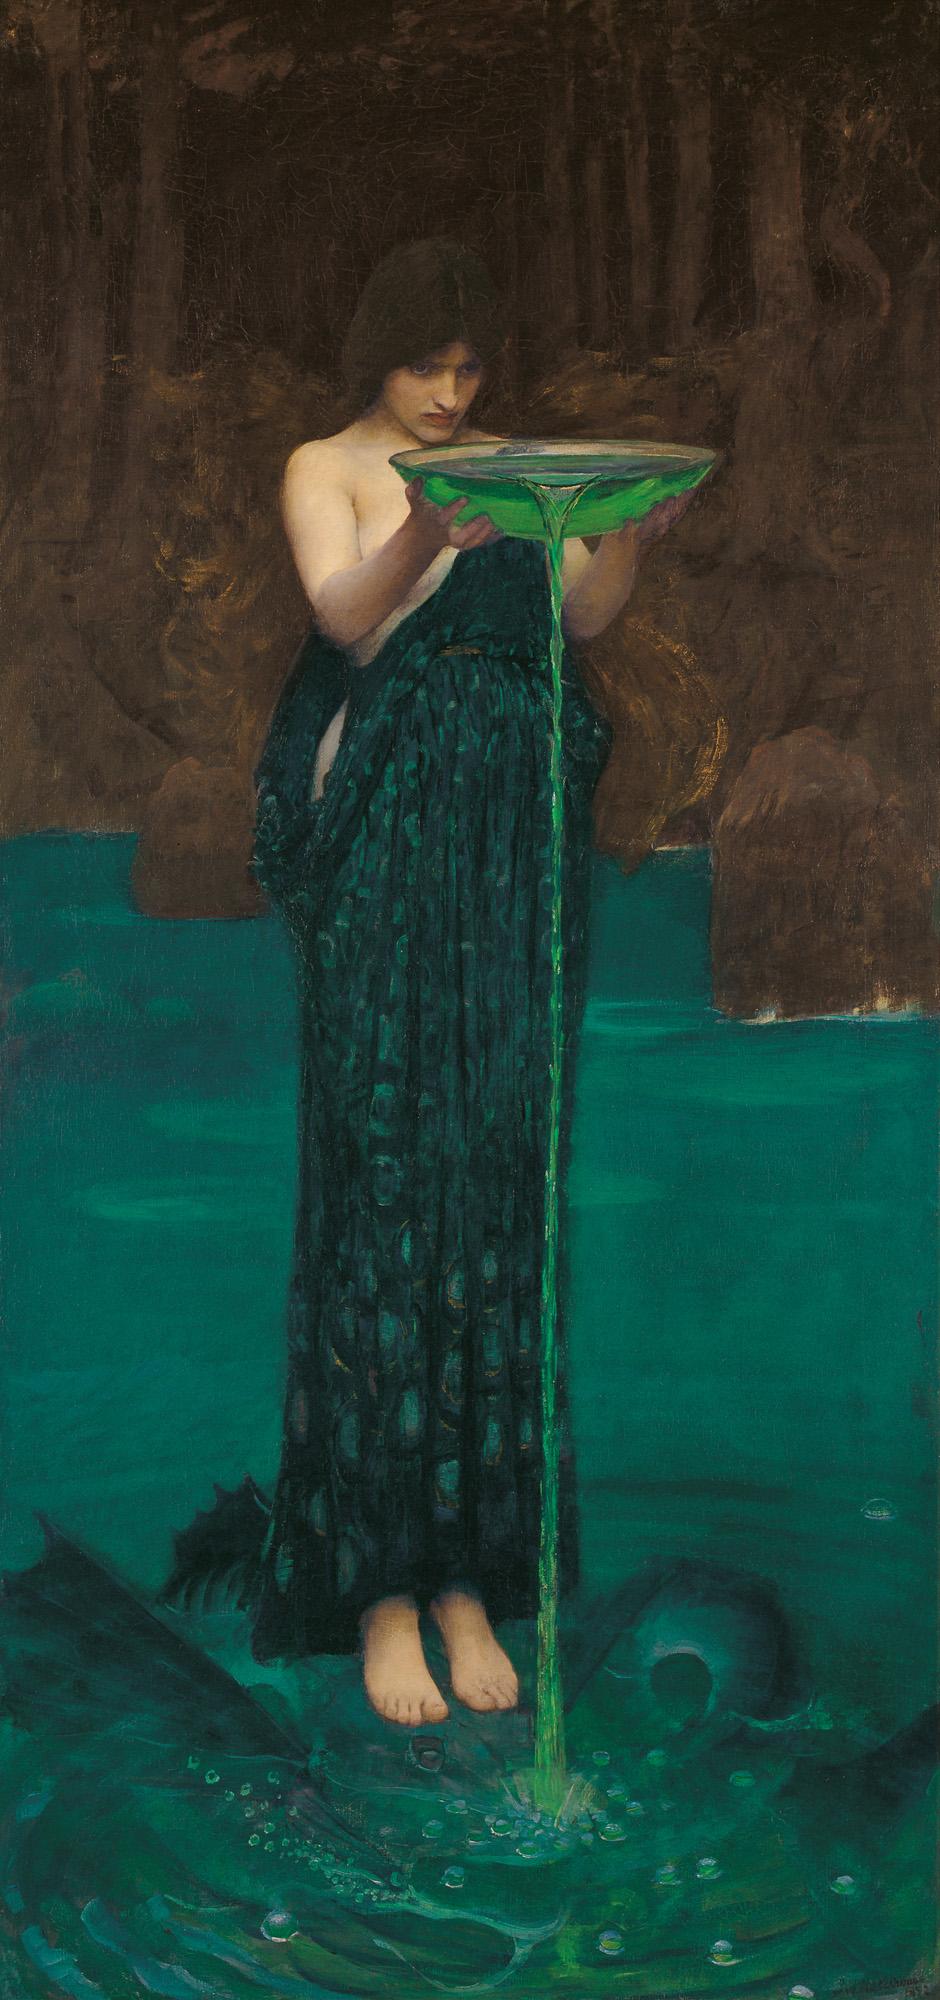 J. W. Waterhouse, Britain, 1849 - 1917,  Circe Invidiosa , 1892, London, oil on canvas; South Australian Government Grant 1892, Art Gallery of South Australia, Adelaide.